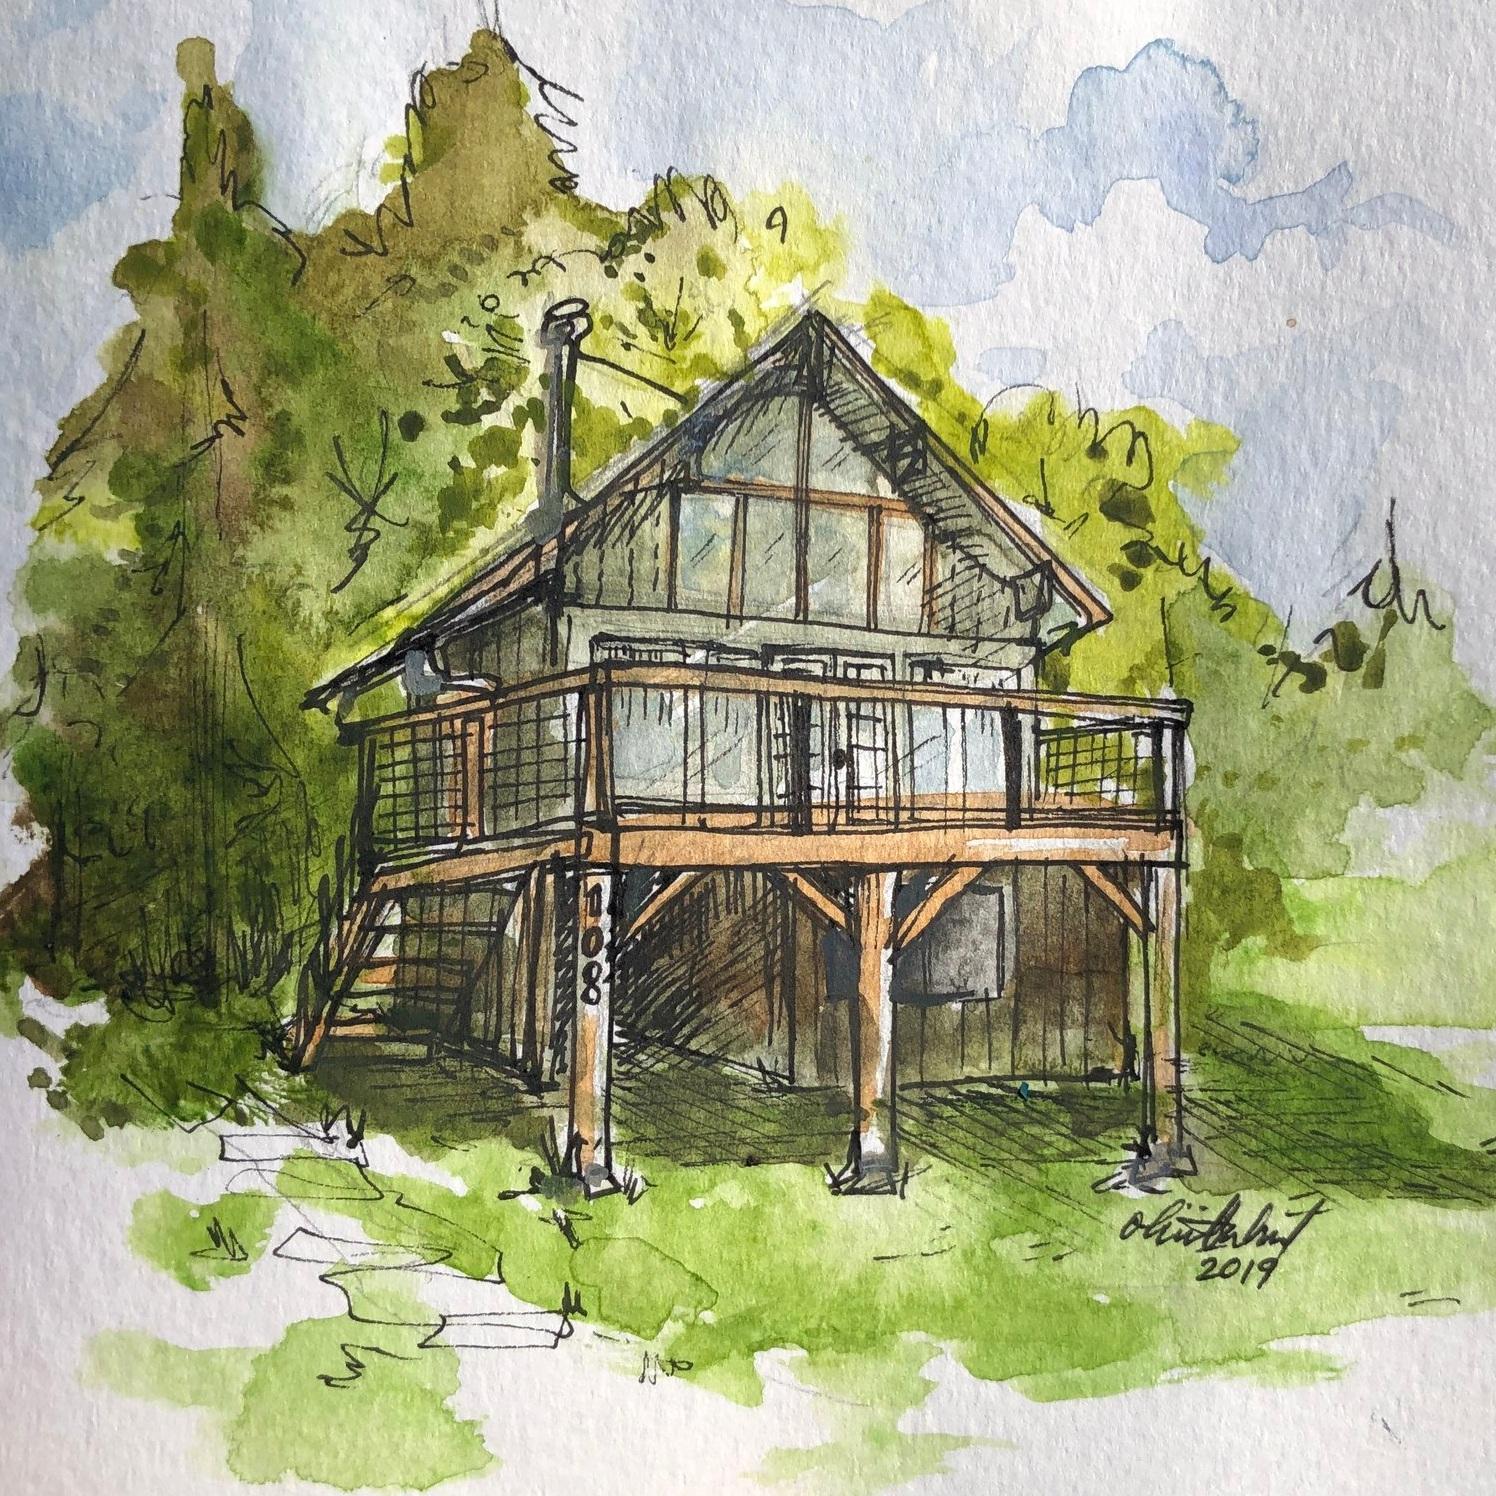 Orcas Island Cabin 2019  Watercolor and Micron pen